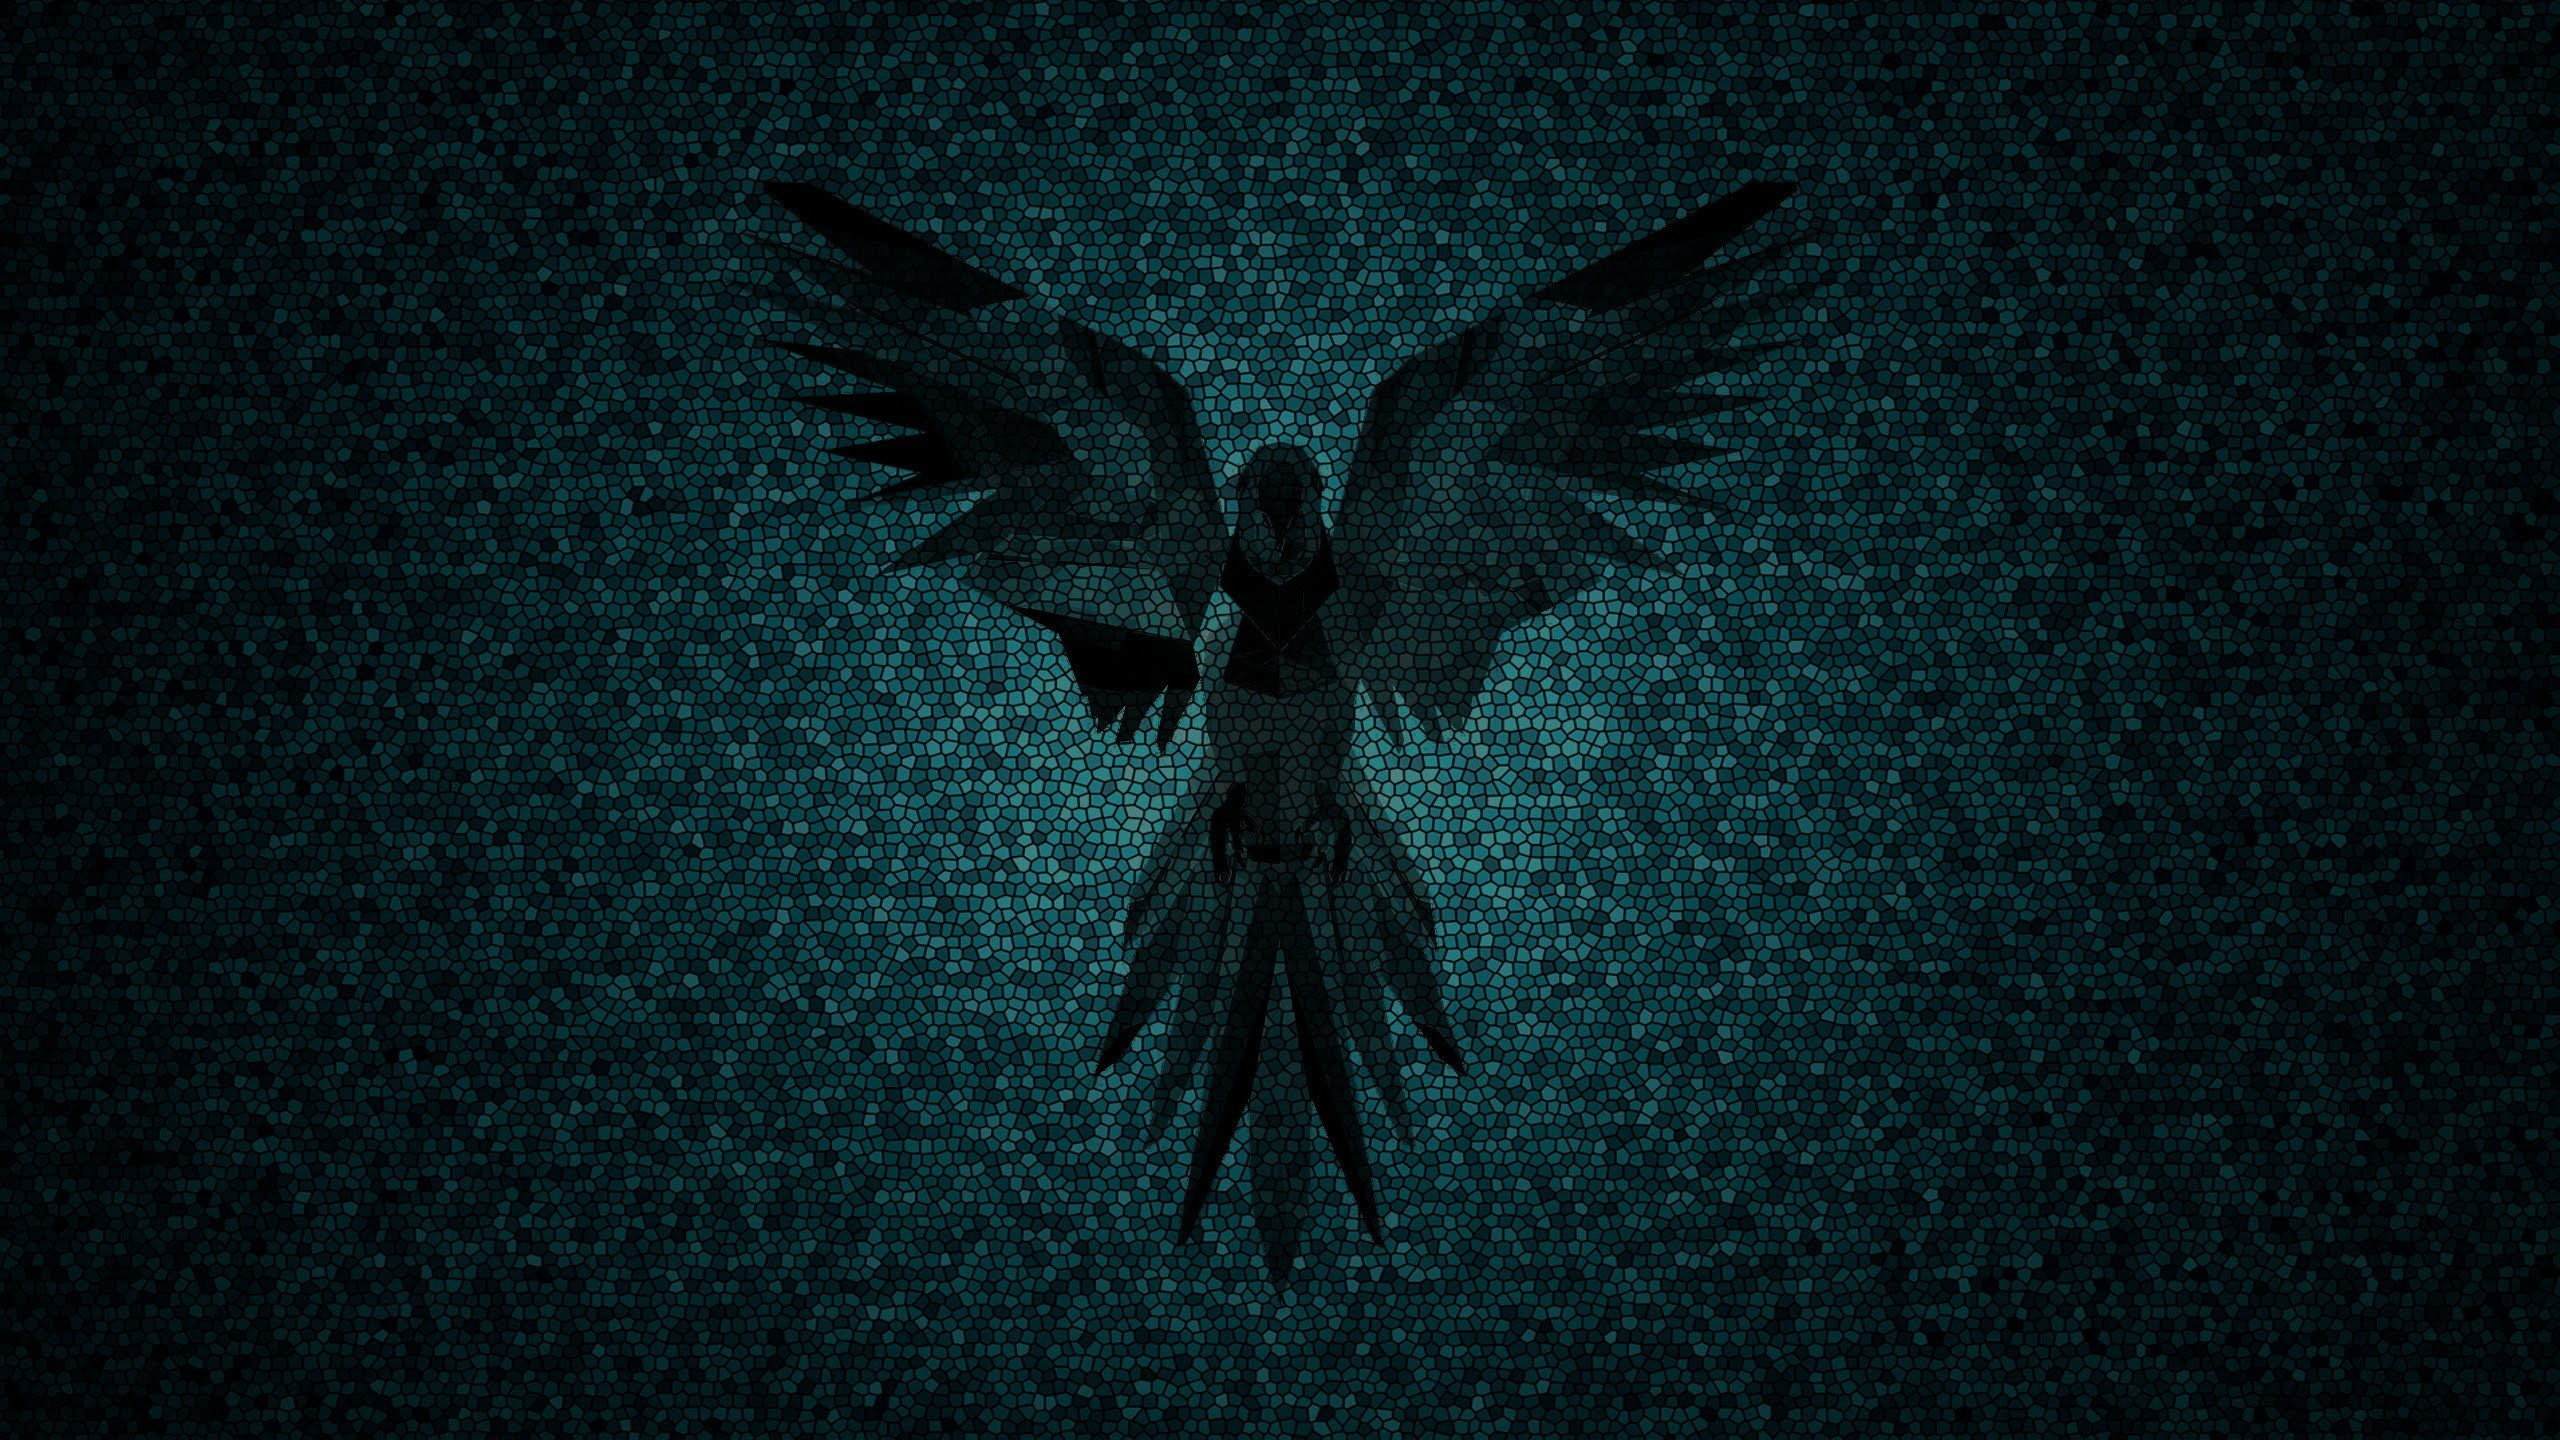 General 2560x1440 parrot Linux Debian hacking